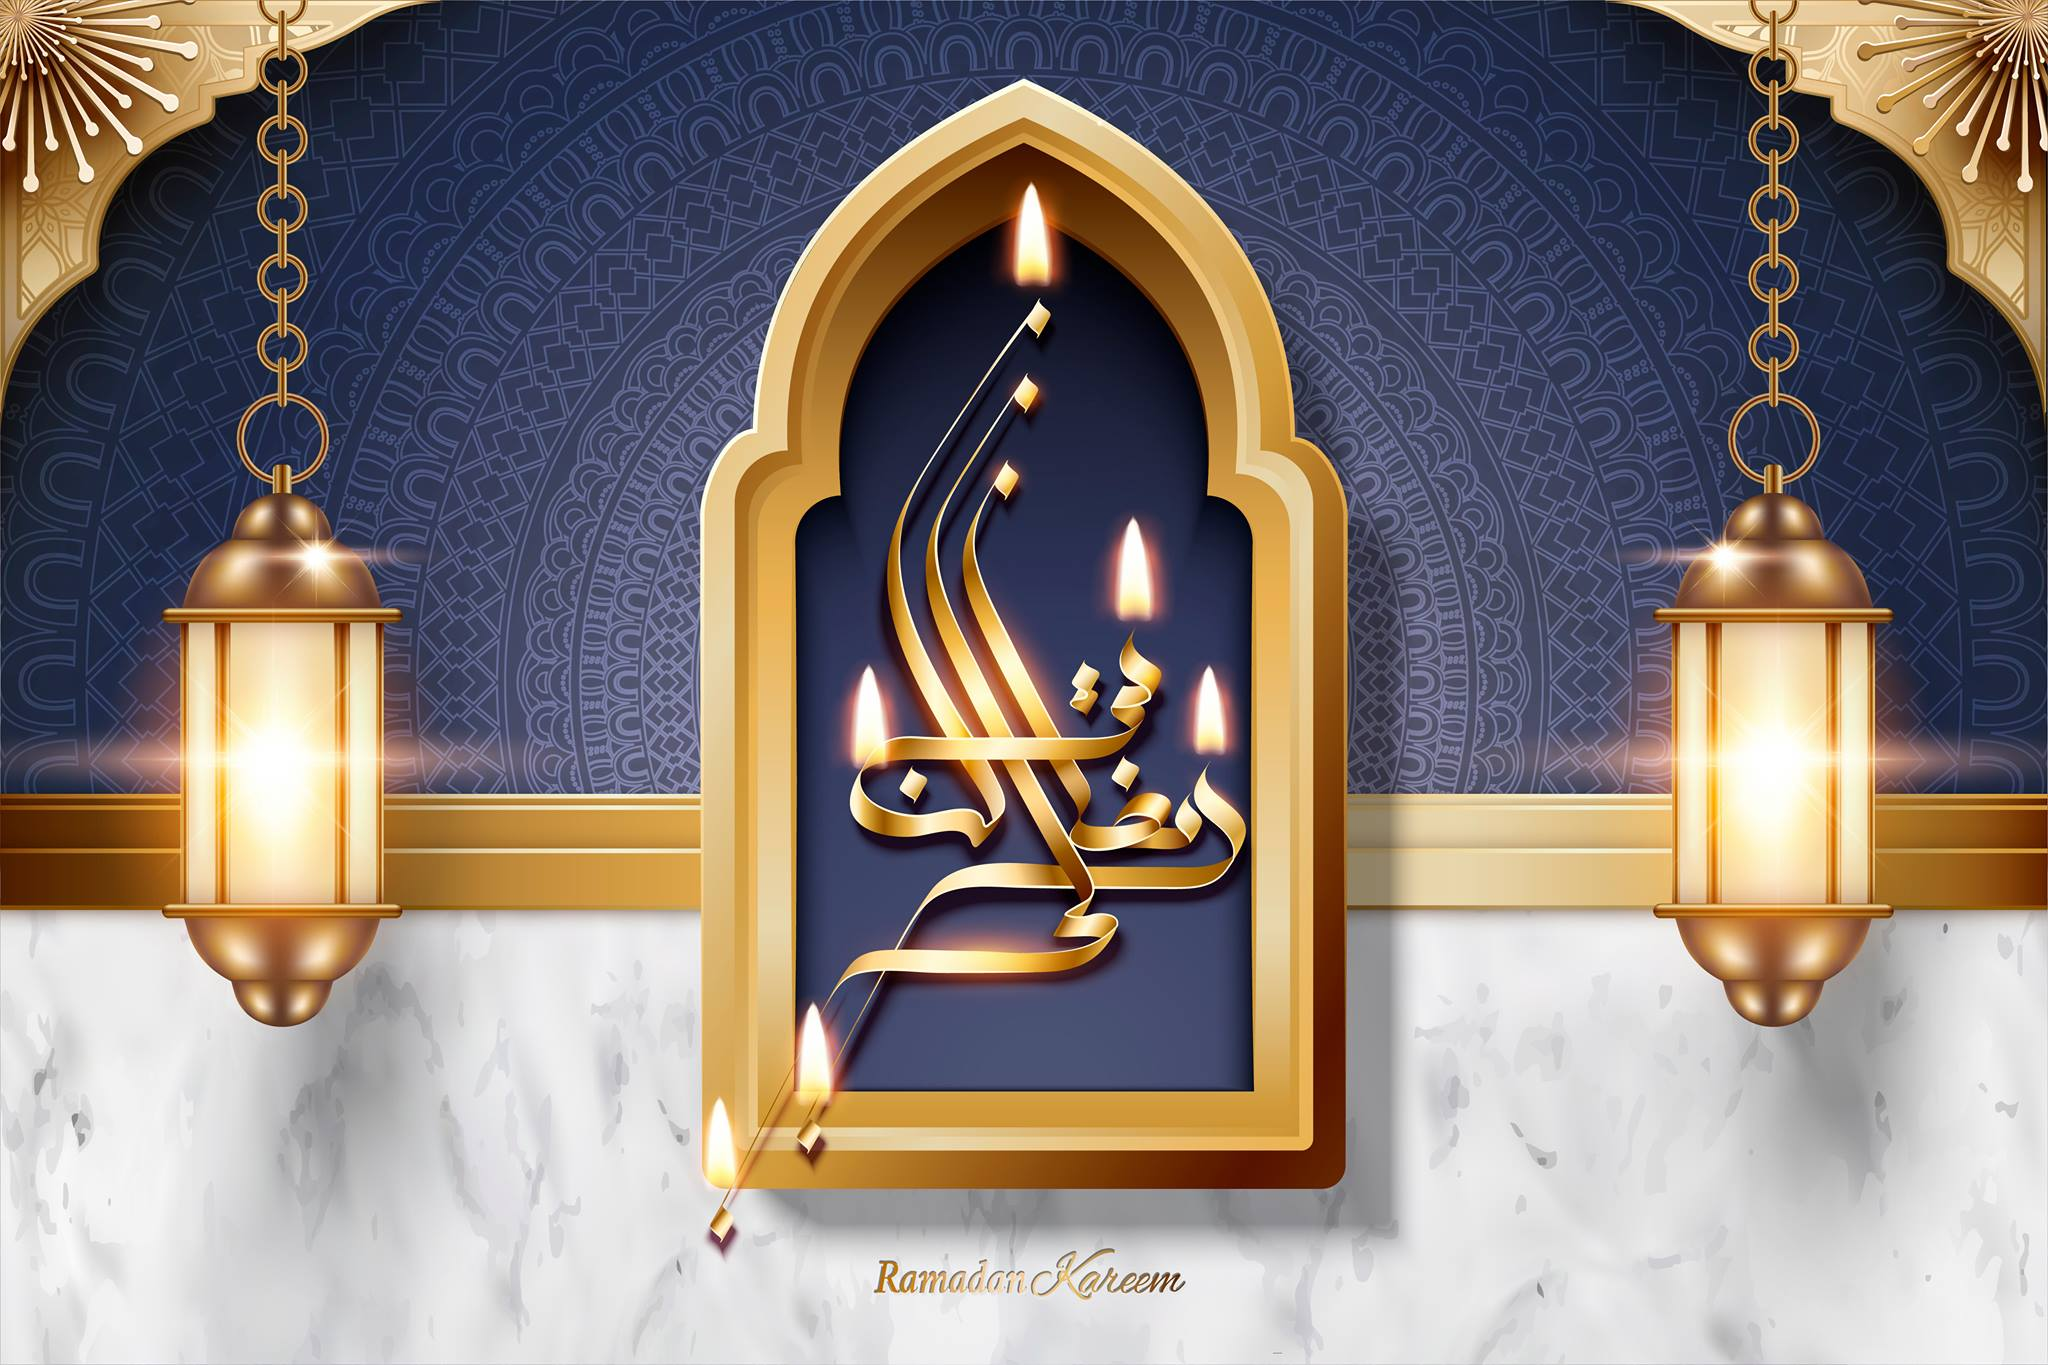 Islamic celebration background with text Ramadan Kareem 5 Islamic celebration background with text Ramadan Kareem